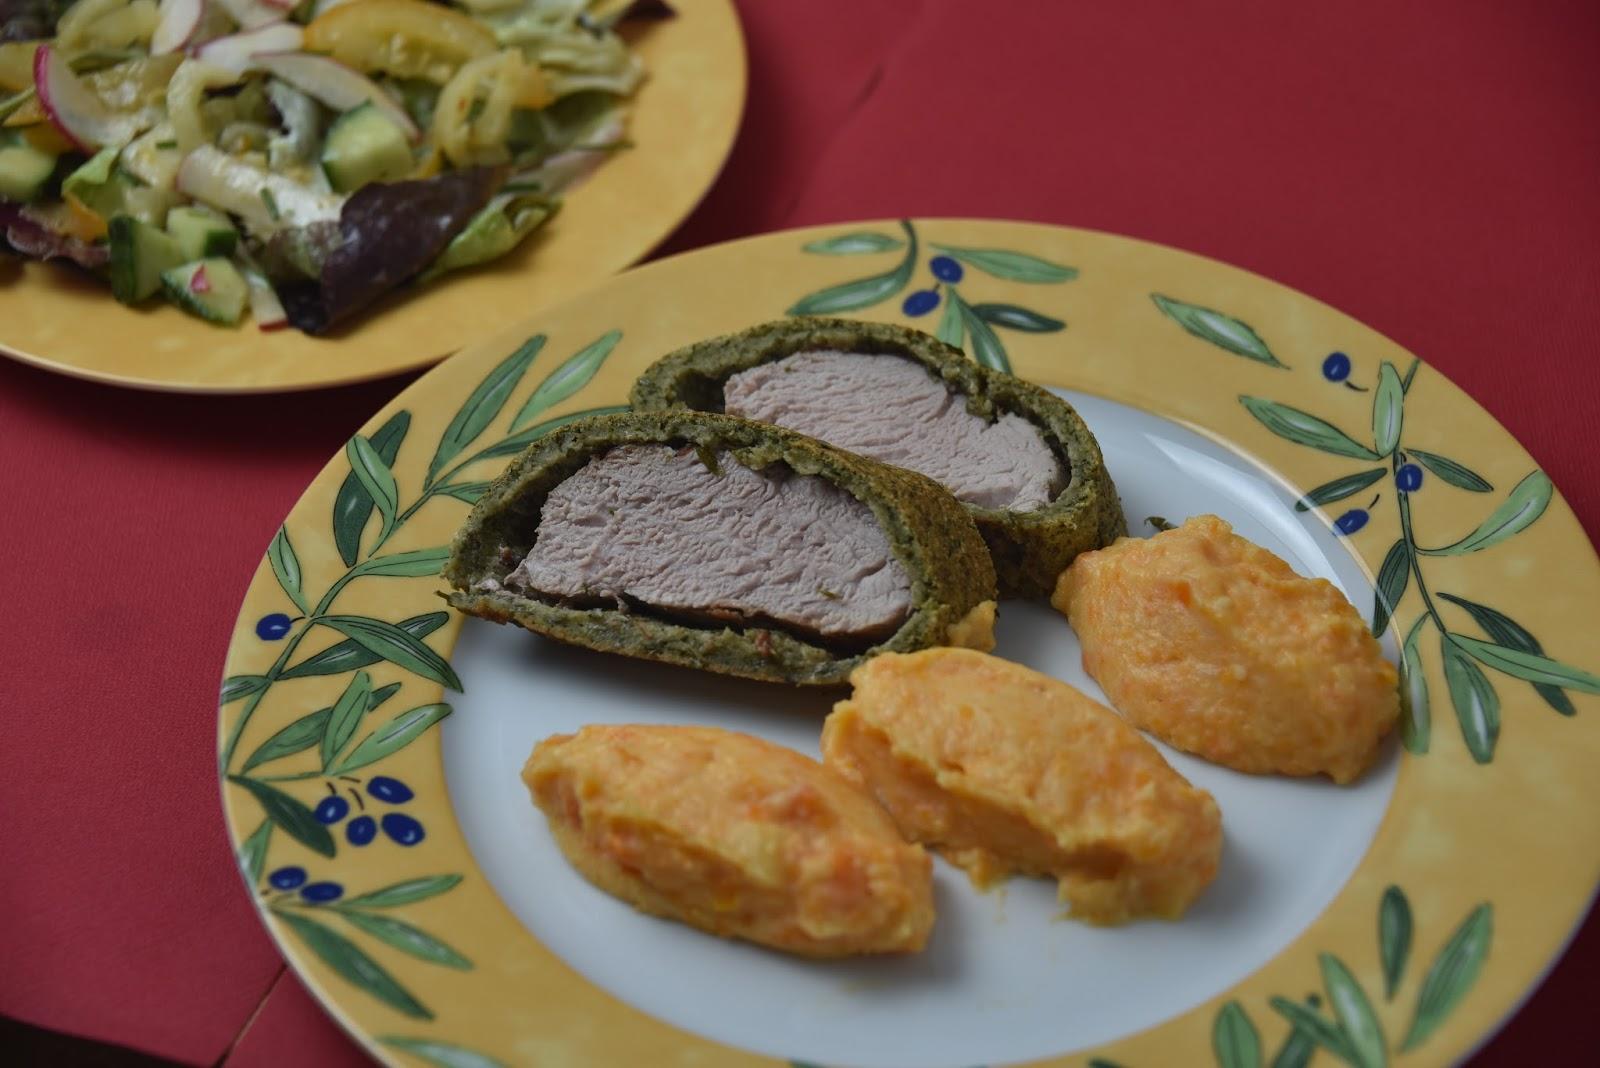 Mini Kühlschrank Mit Jelent : Schweinefilet im kräutermantel mit möhren kartoffelpüree sertés